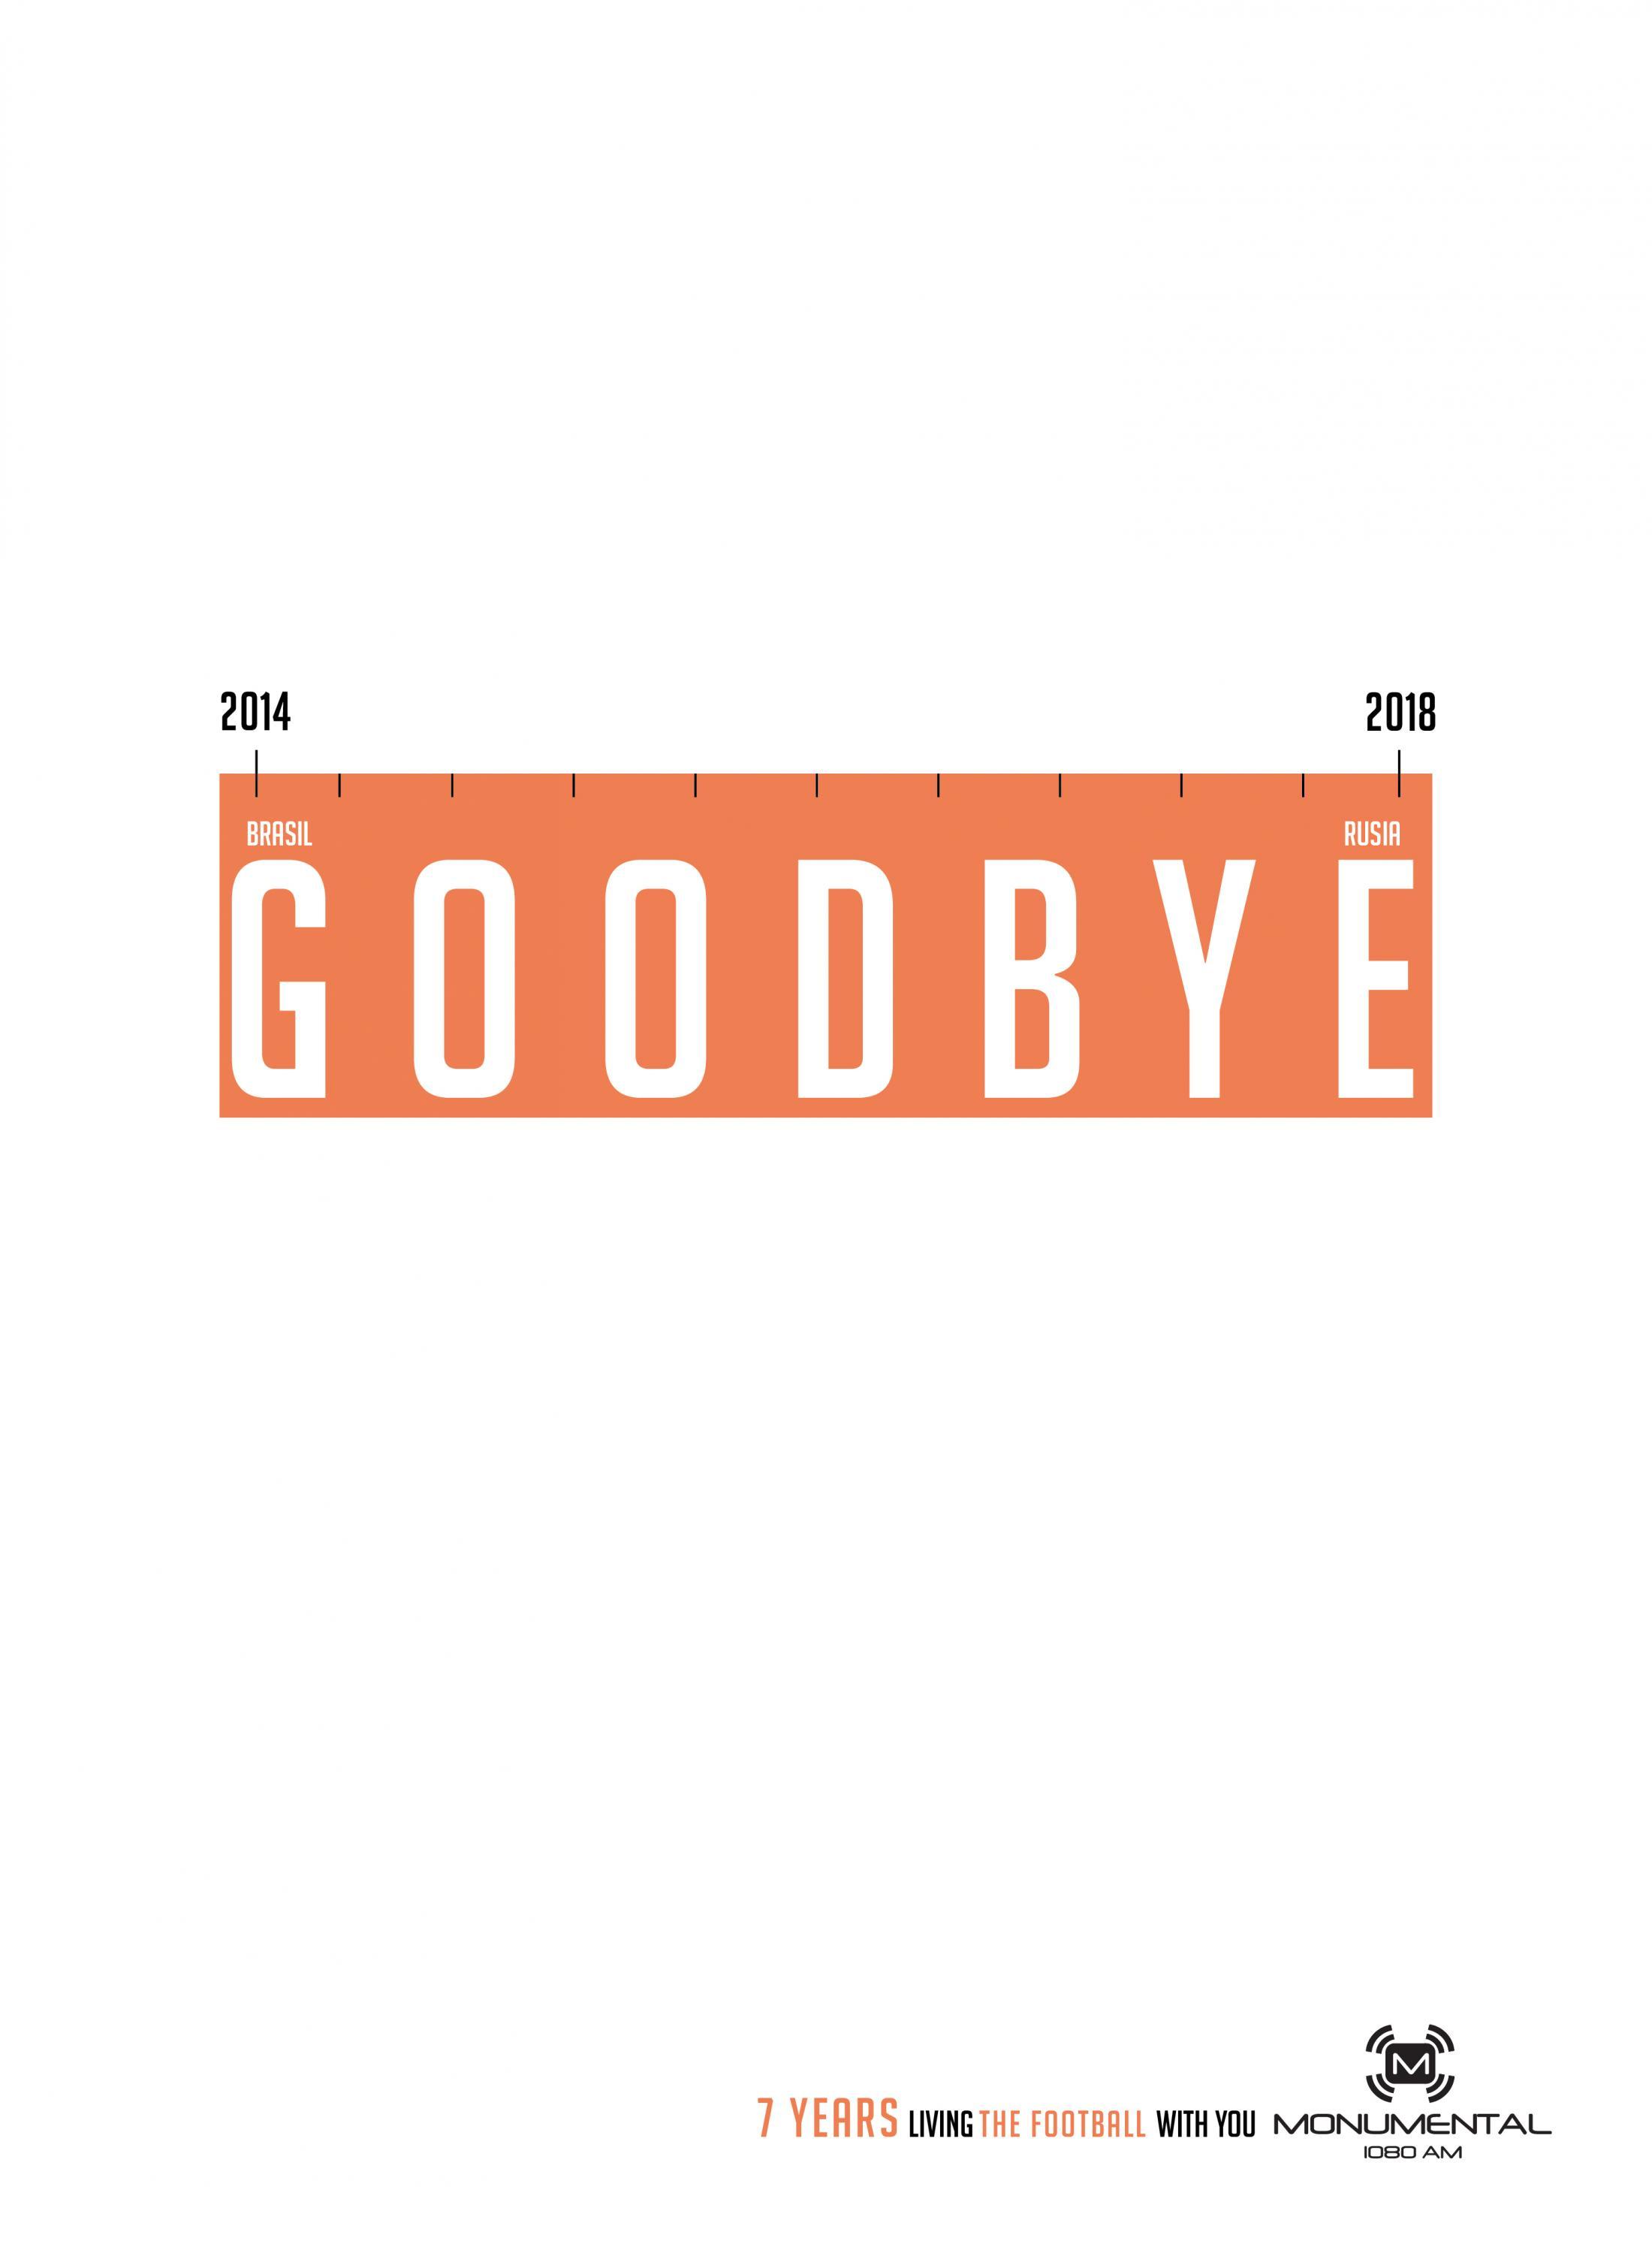 Monumental Print Ad - Monumental 7th Anniversary - Goodbye